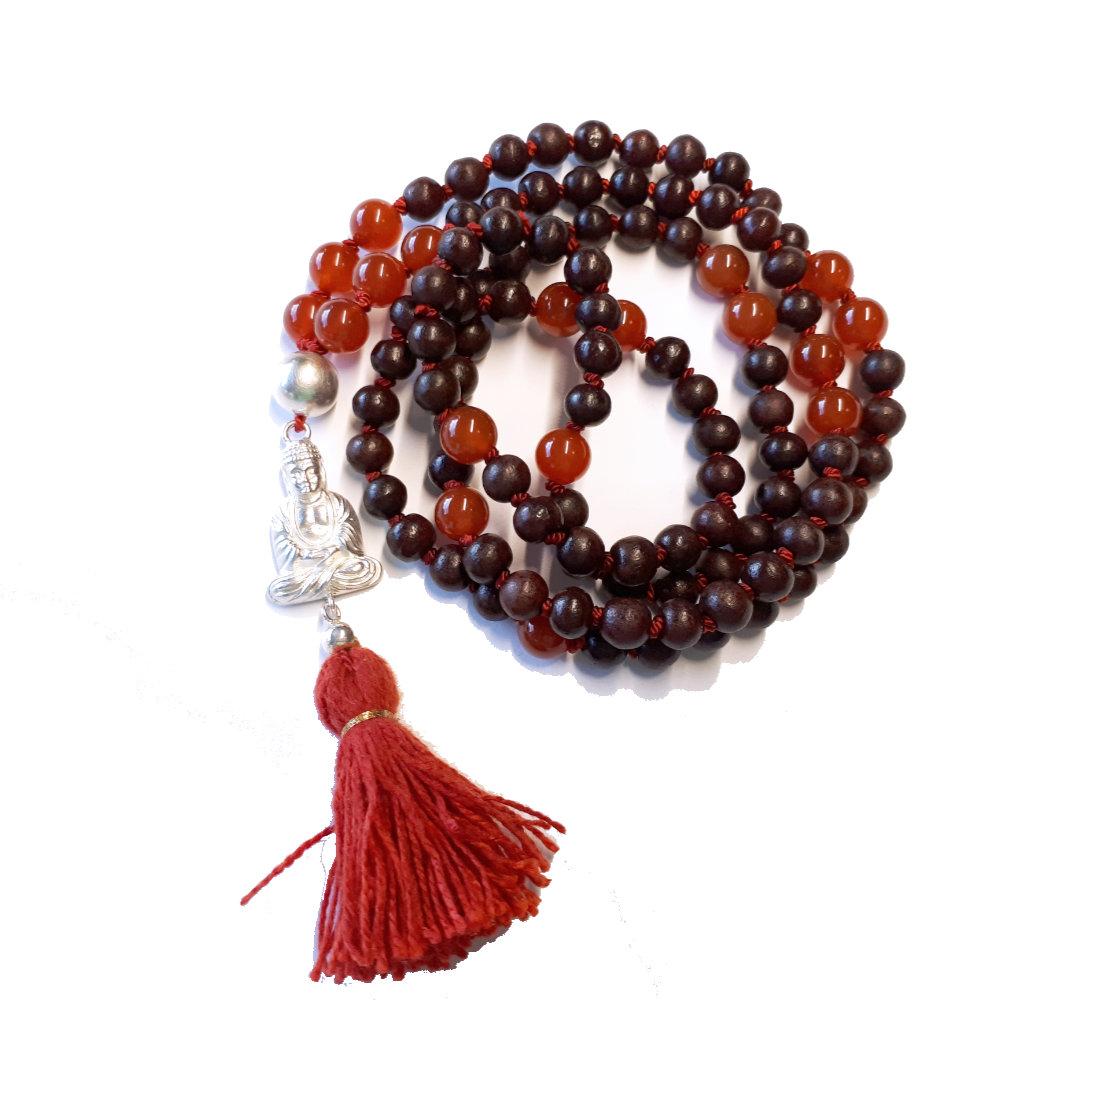 handgefertigte Mala aus Rosenholz und Karneol. Buddha aus Sterlingsilber